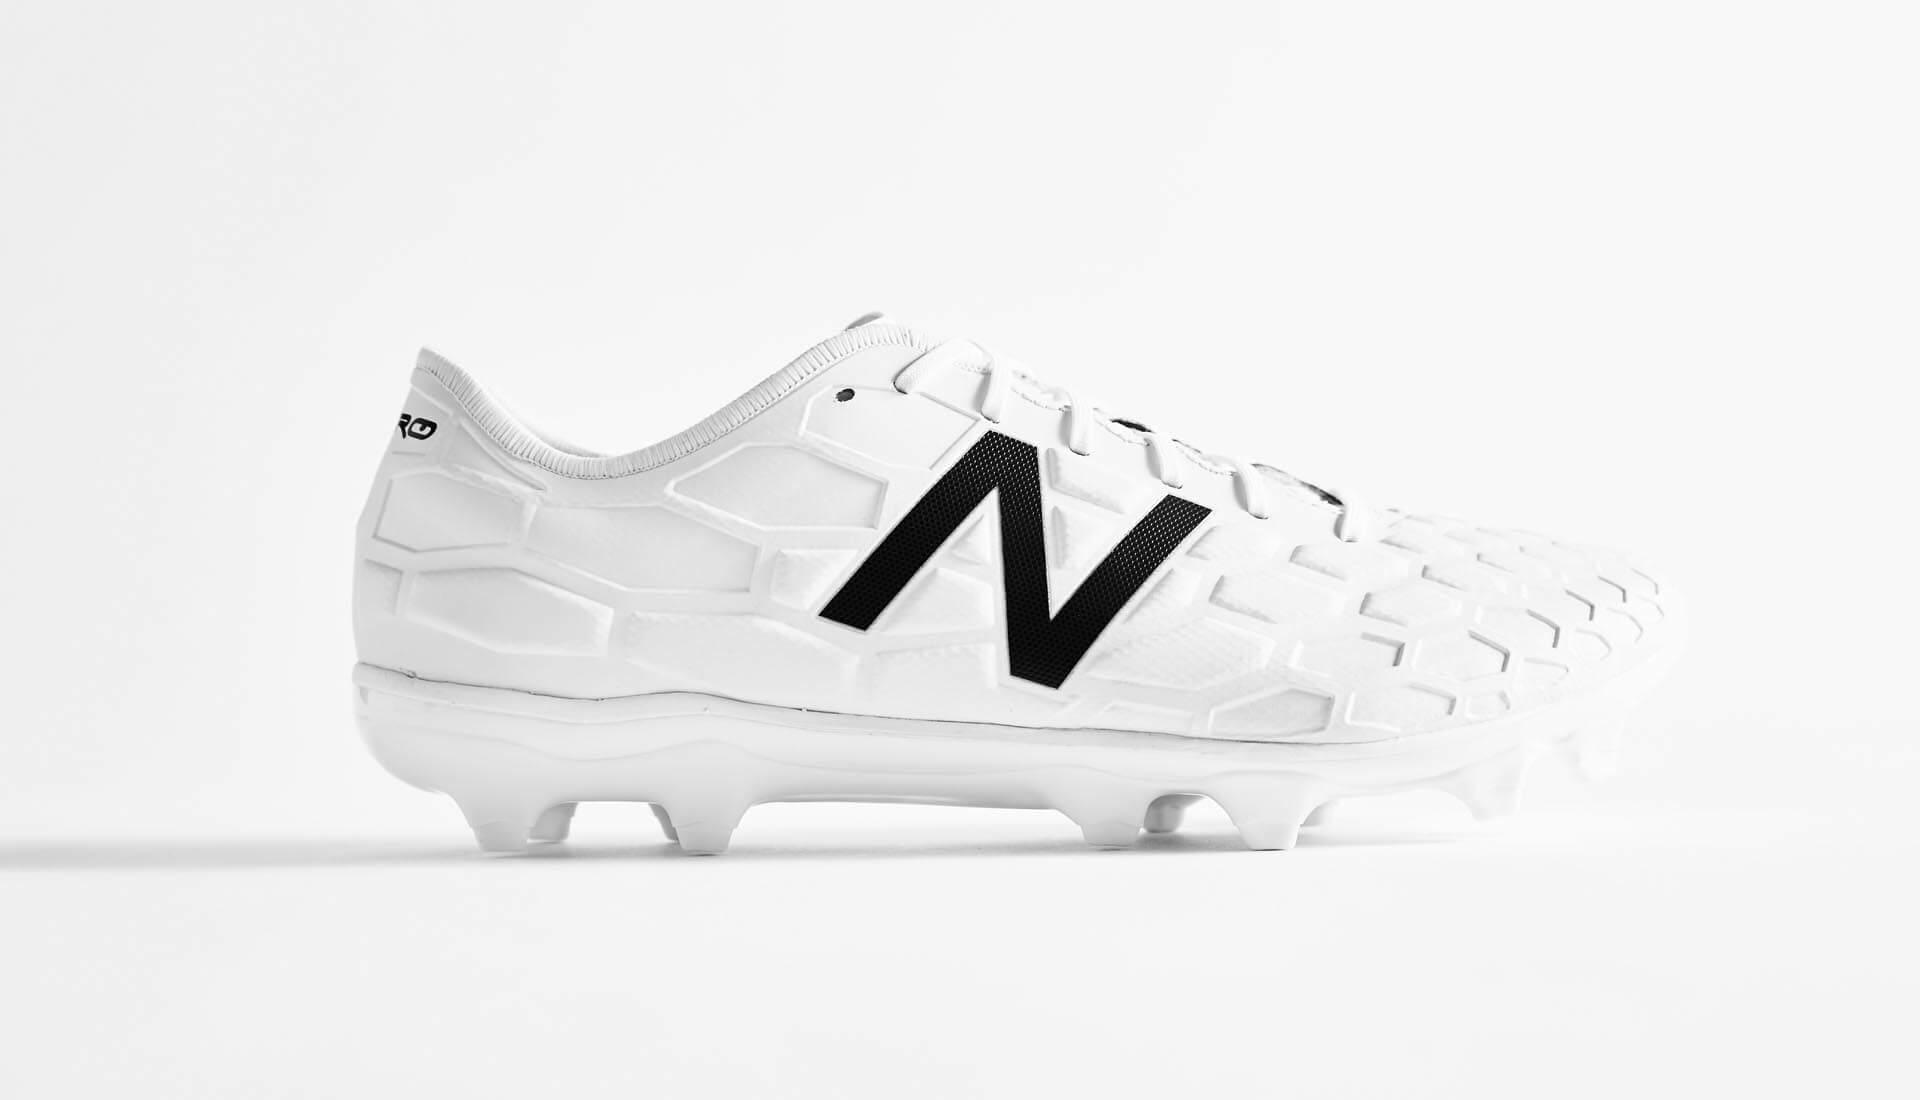 a3953226e New Balance Blackout & Whiteout Football Boots - SoccerBible